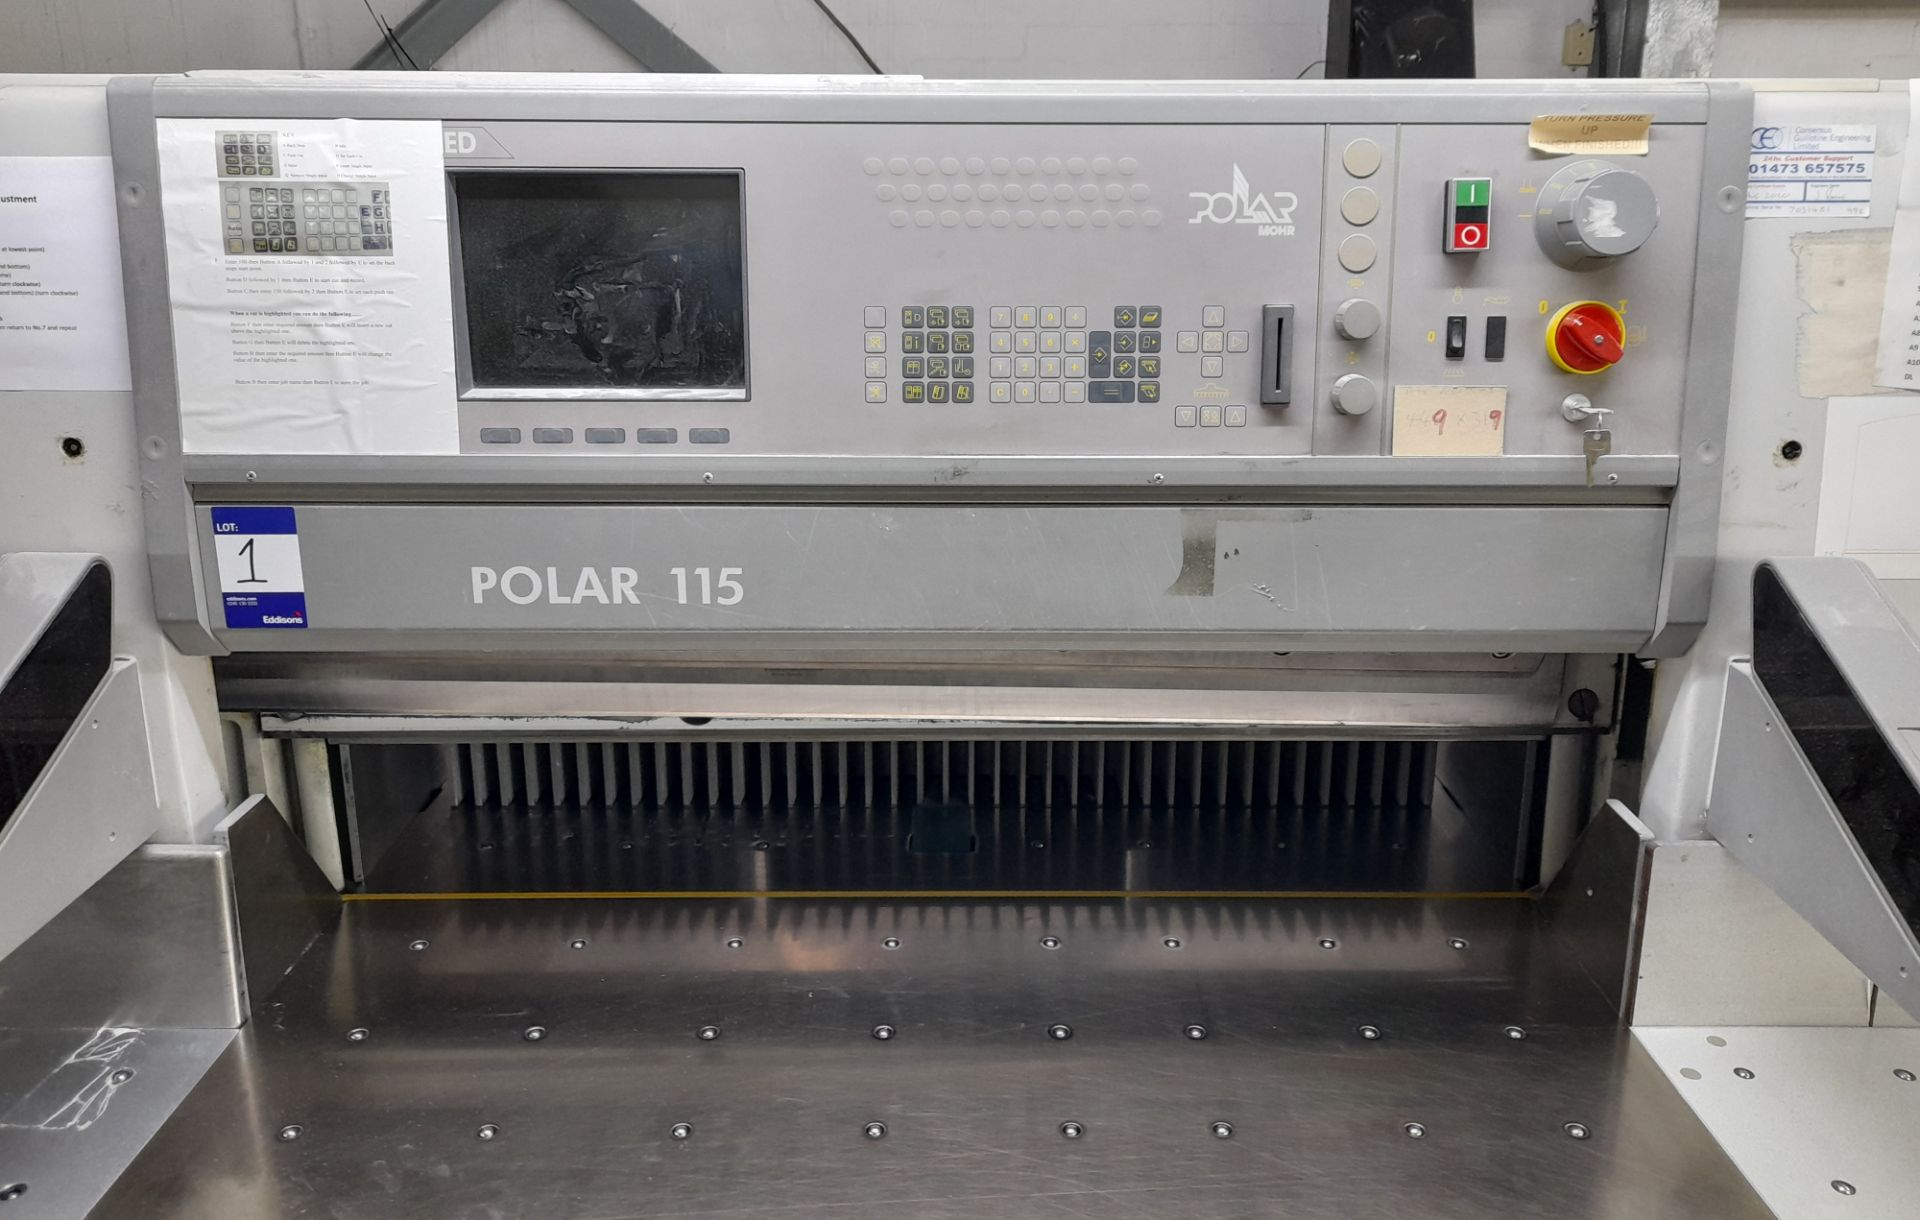 Polar Mohr 115 ED guillotine, Machine Number: 7031 - Image 3 of 9